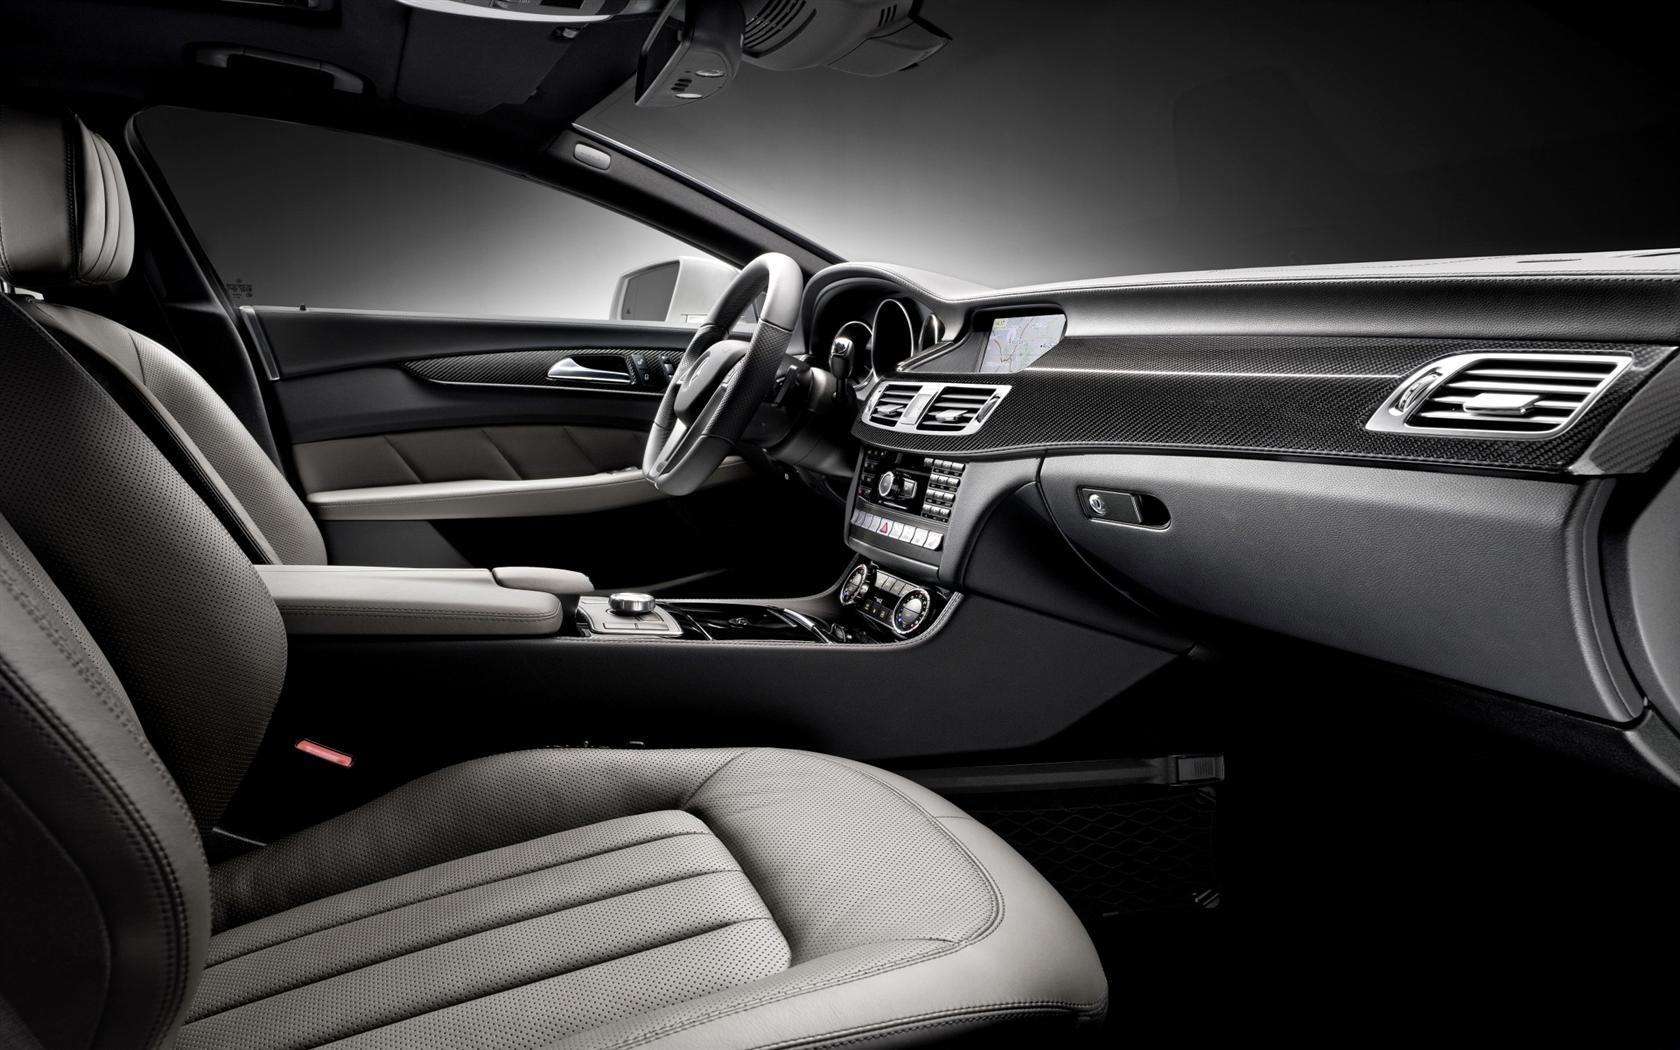 2012 Mercedes-Benz CLS-Class Image